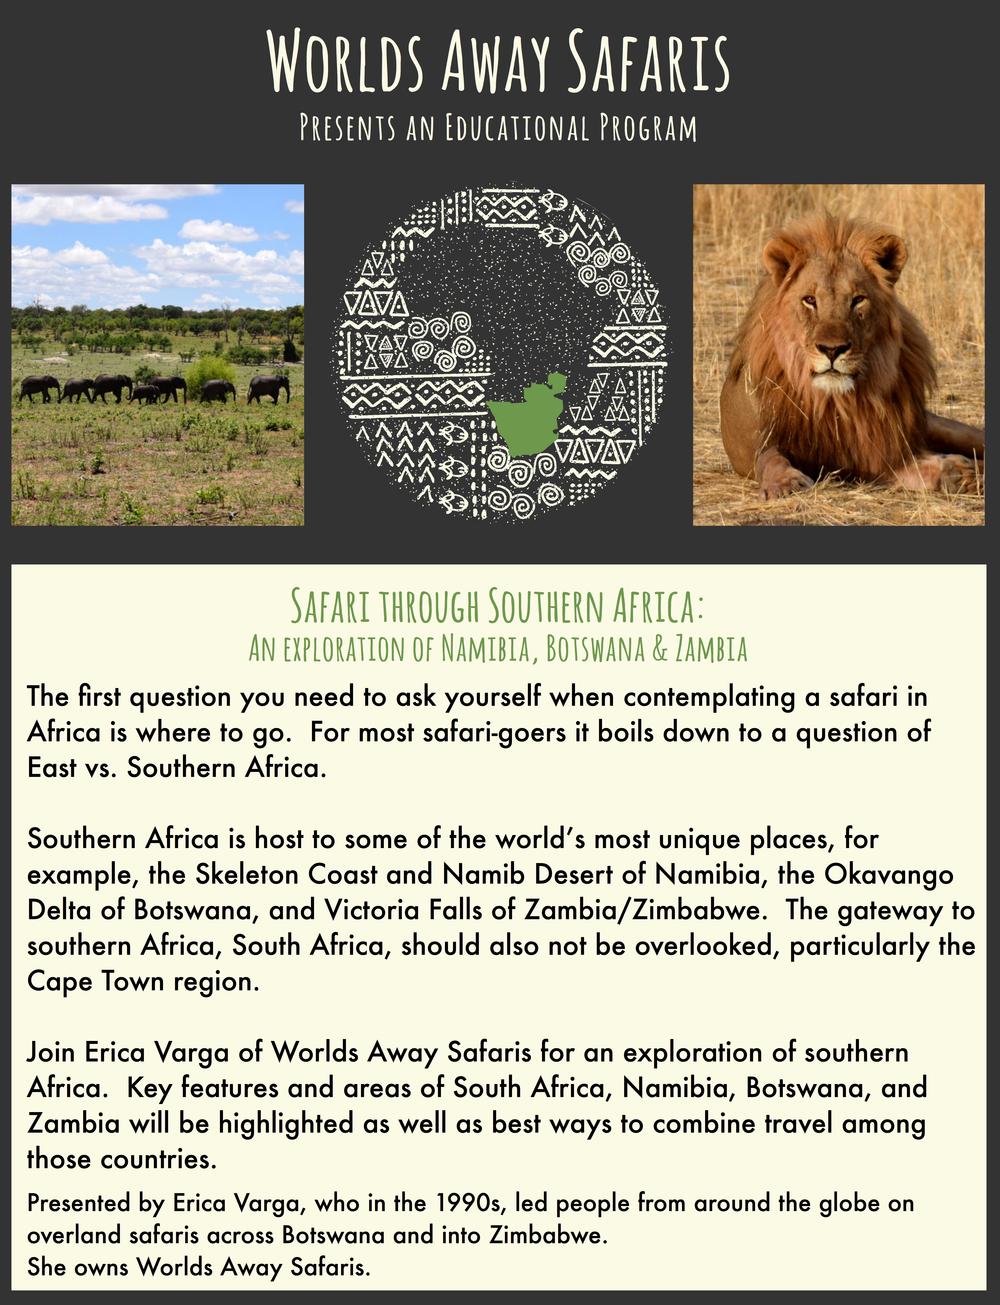 WAS_Safari thru Southern Africa_Program Description.jpg